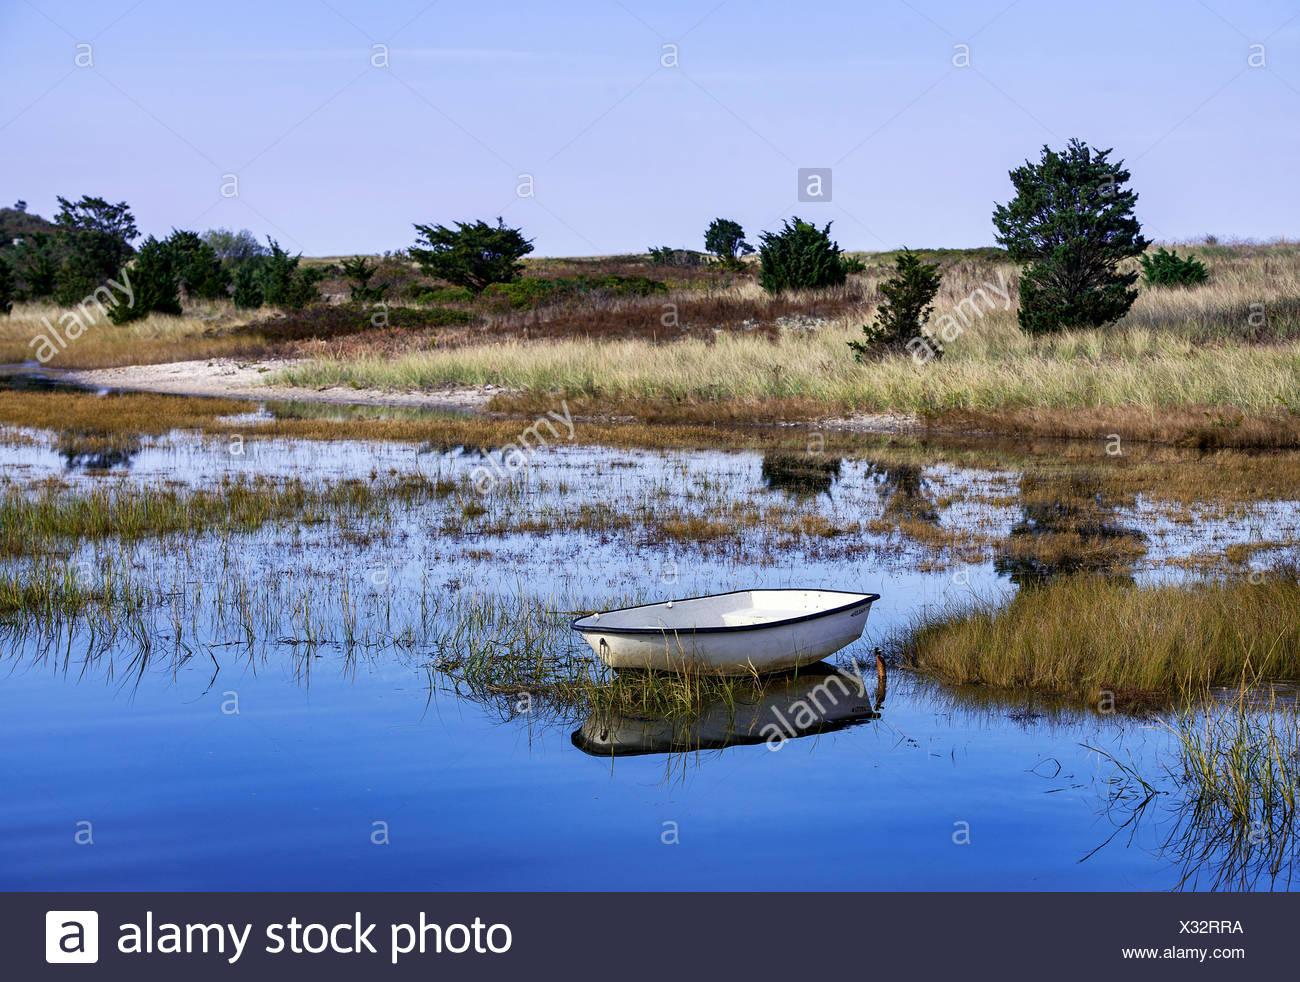 Dinghy anchored in shallow salt pond, Martha's Vineyard, Massachusetts, USA - Stock Image